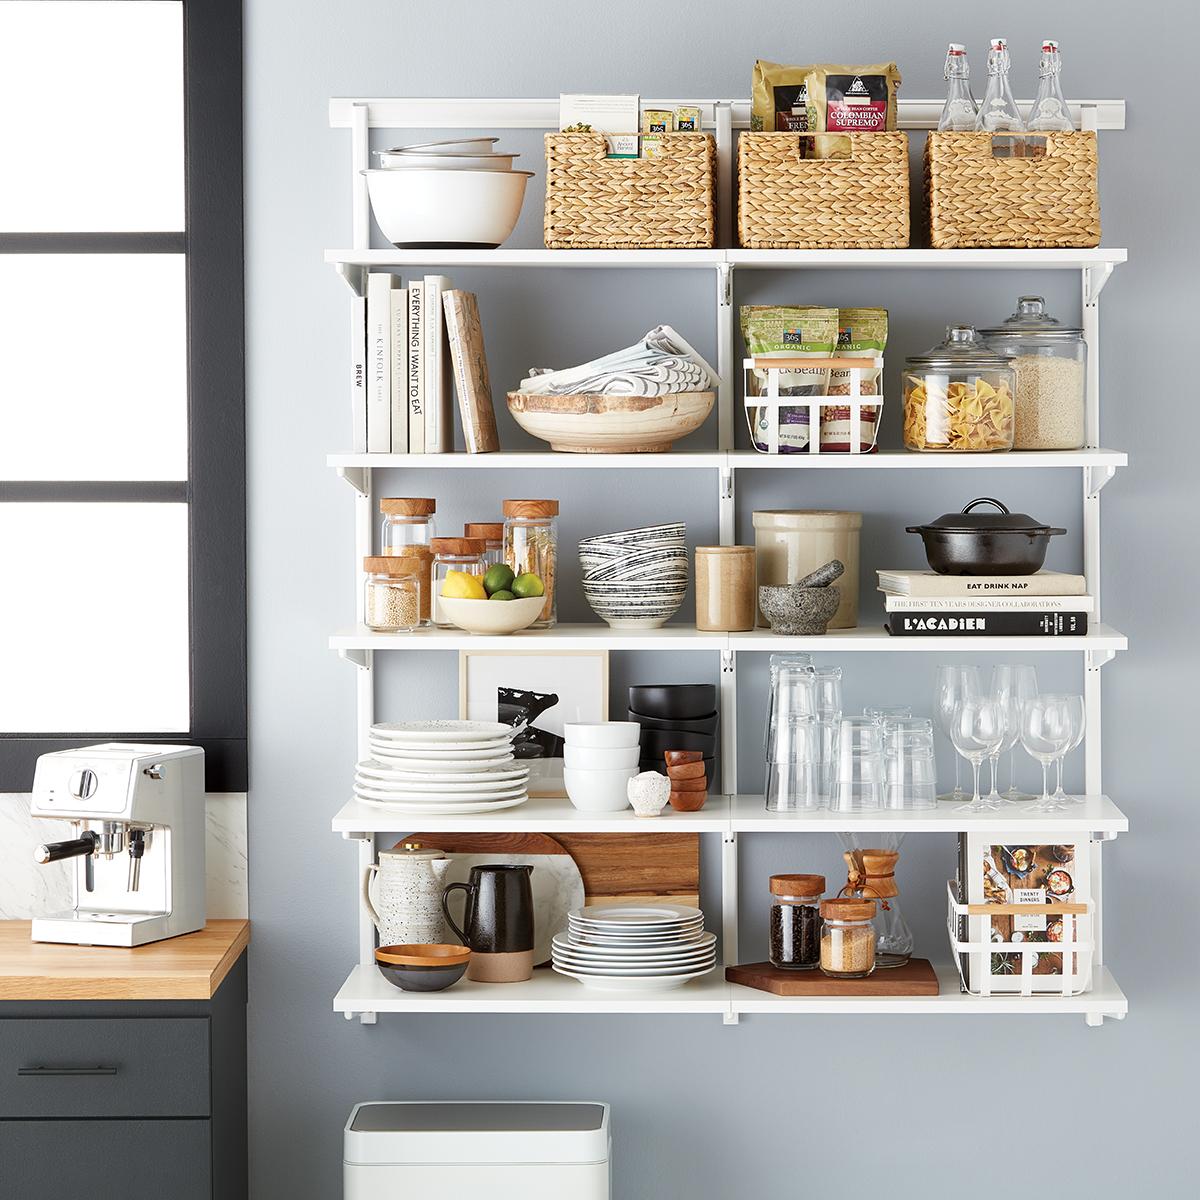 Elfa Classic 4' Open Kitchen Shelving